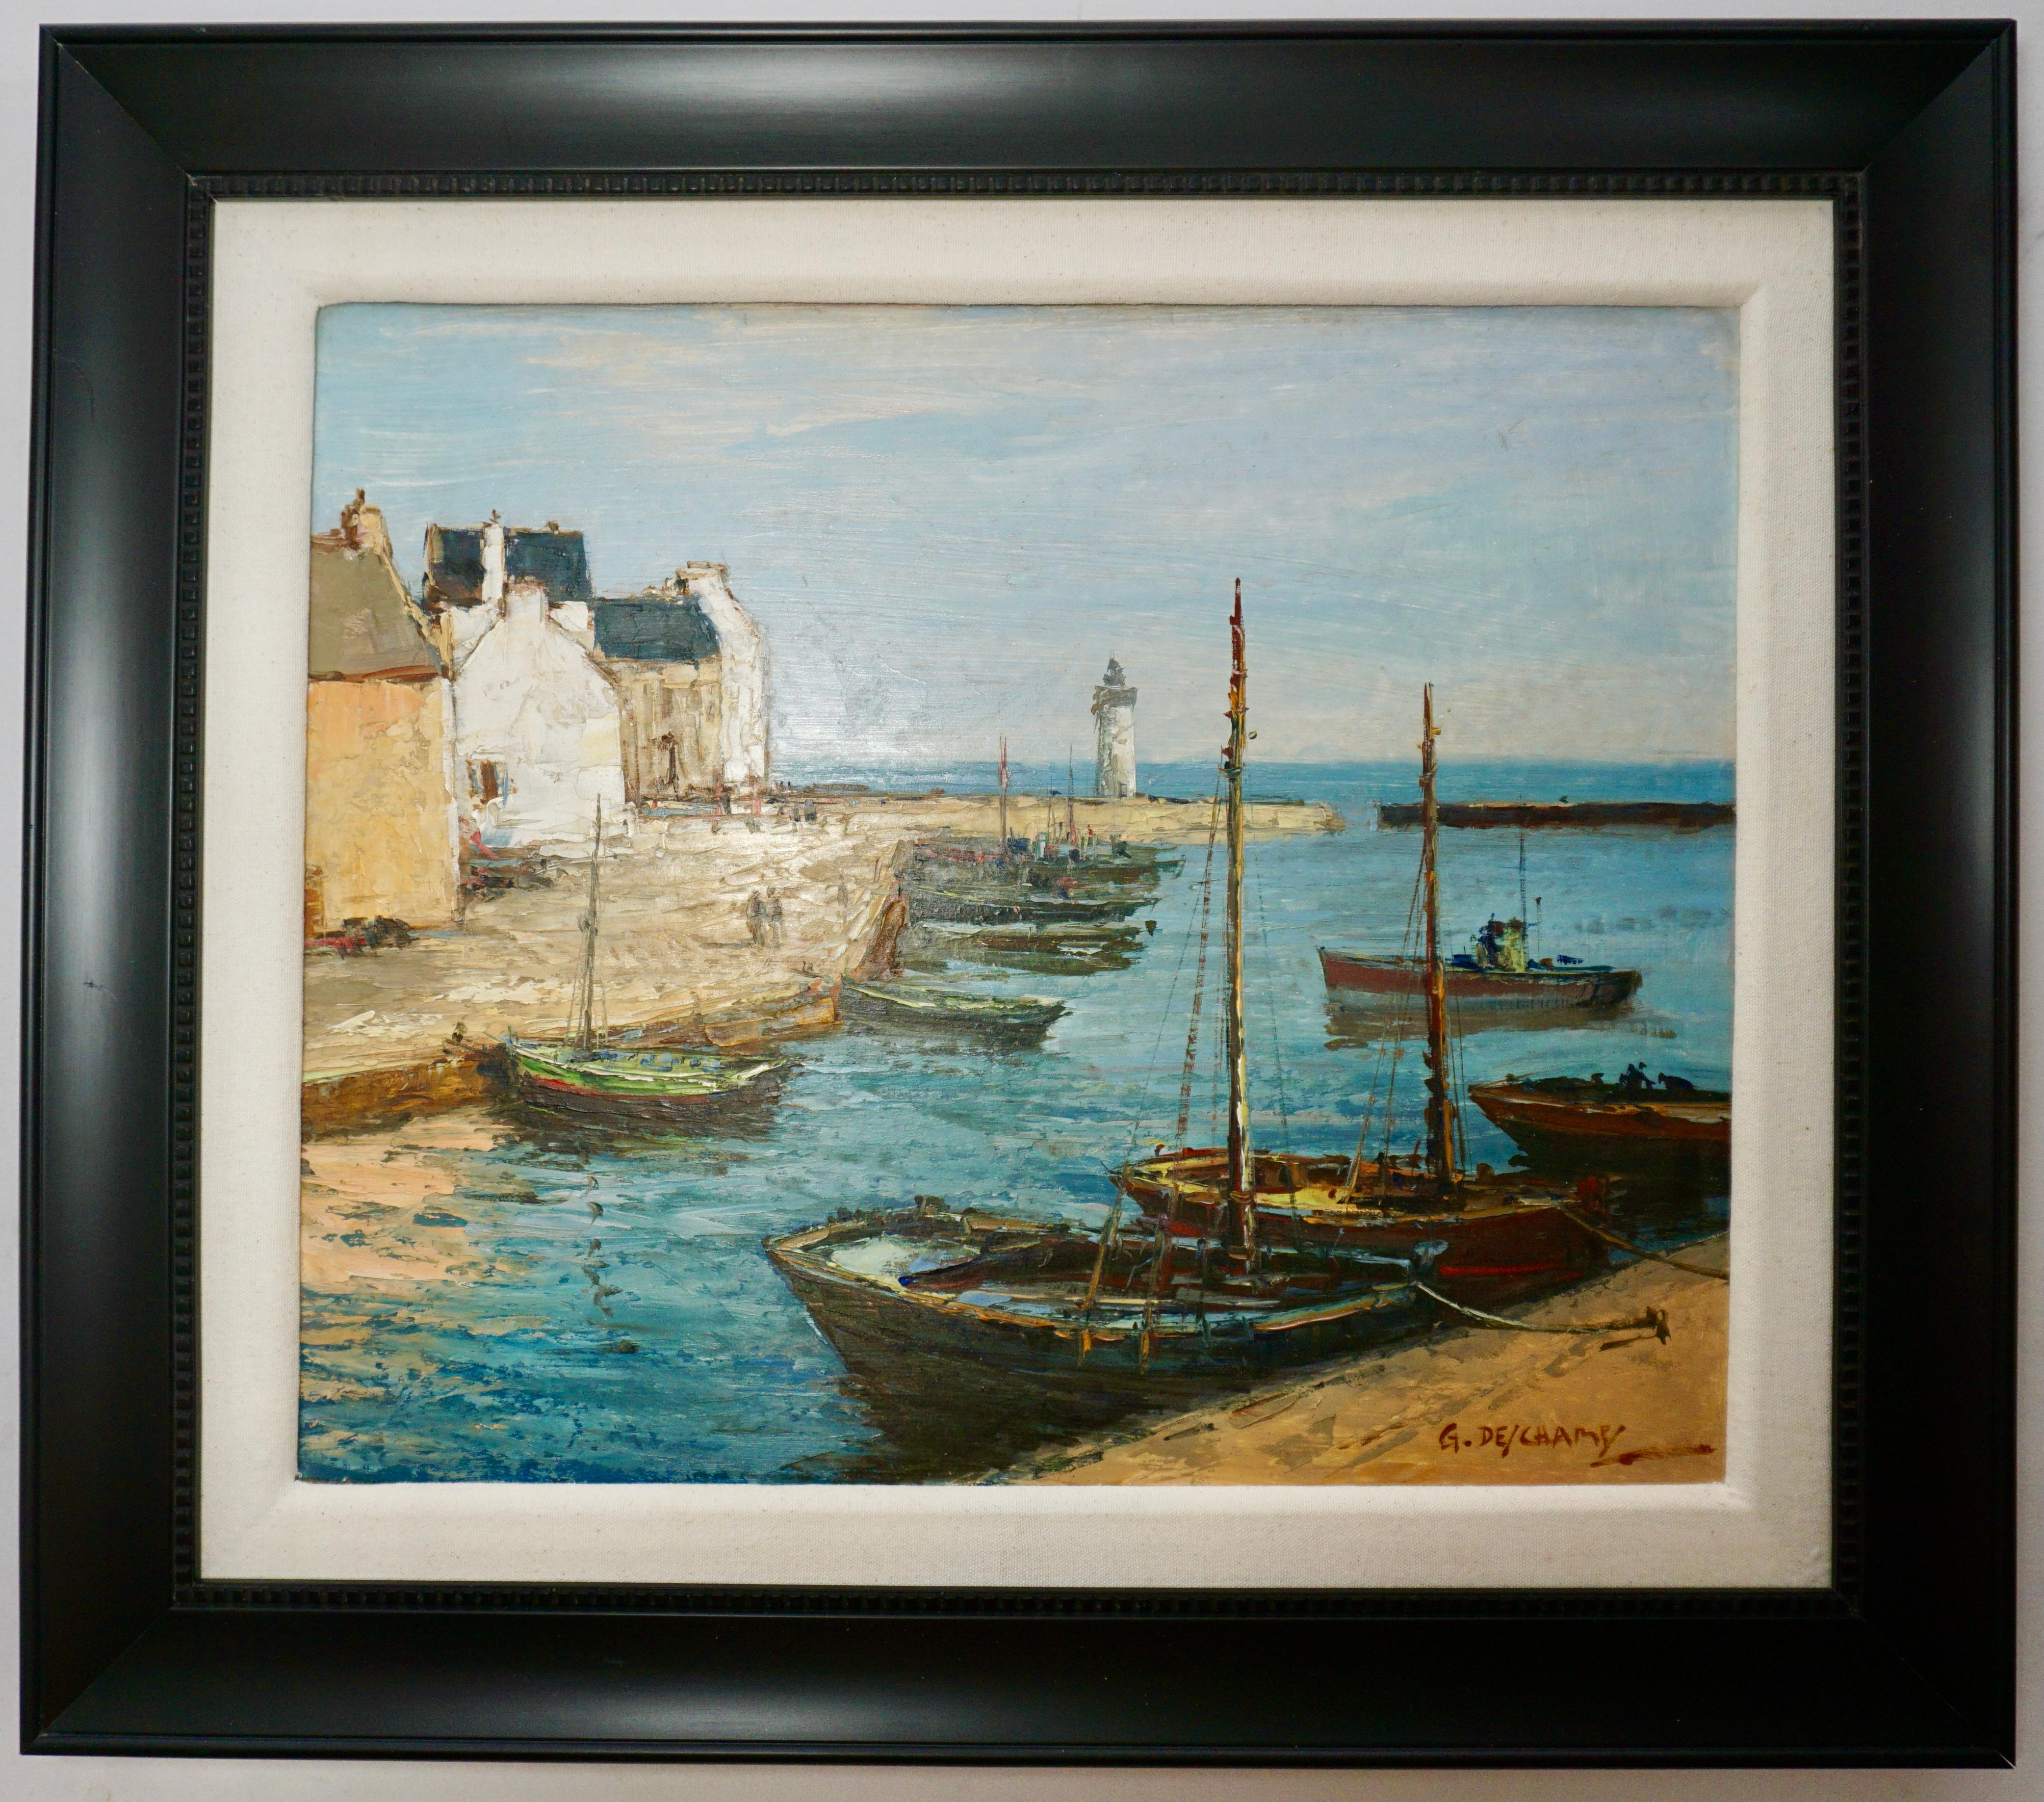 Port Brenton